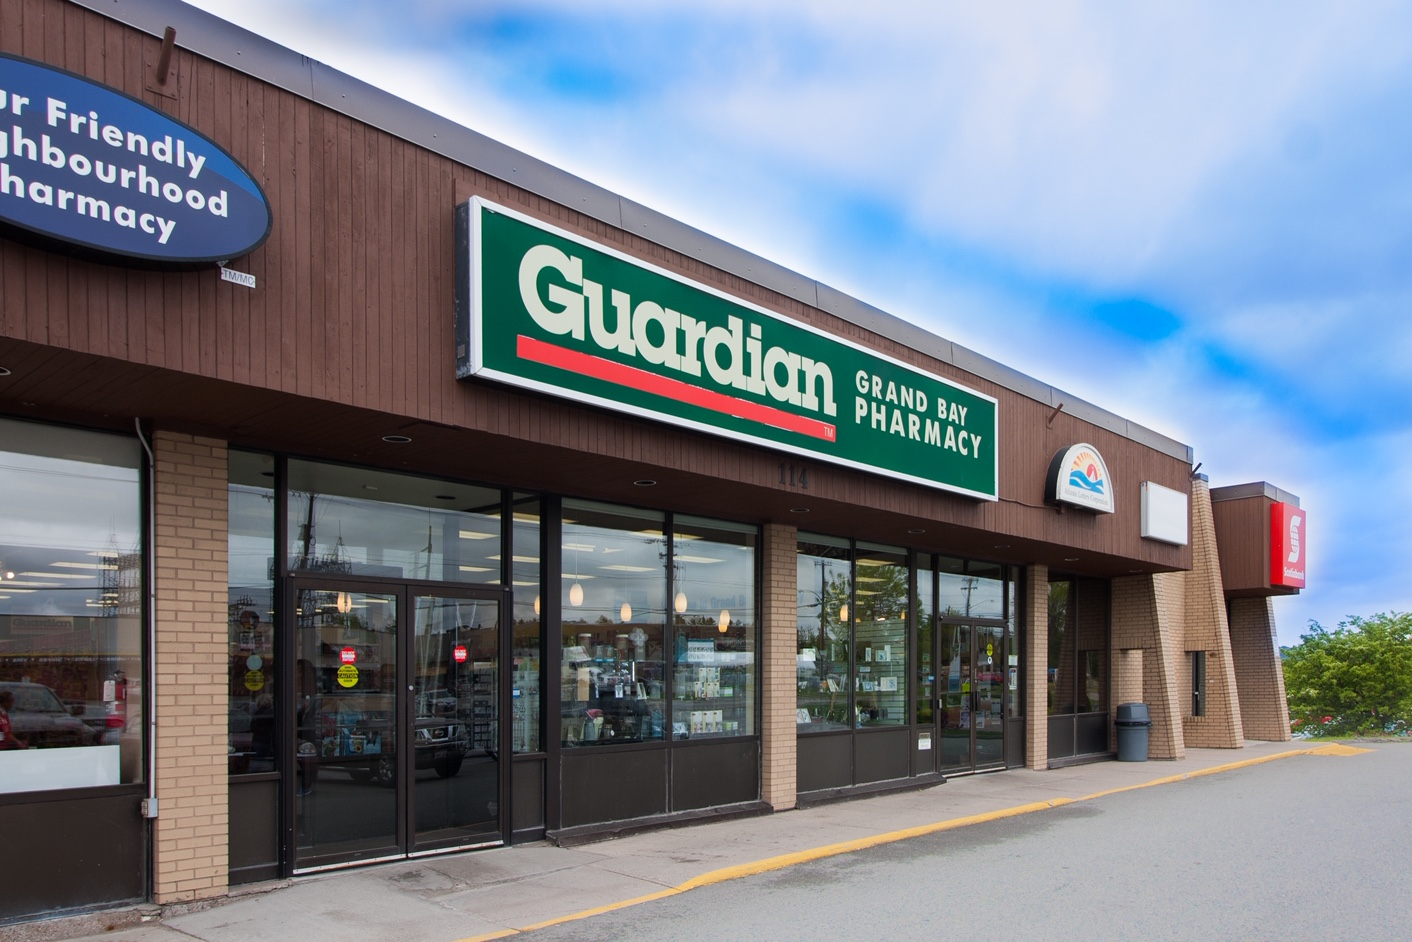 Guardian Grand Bay Pharmacy